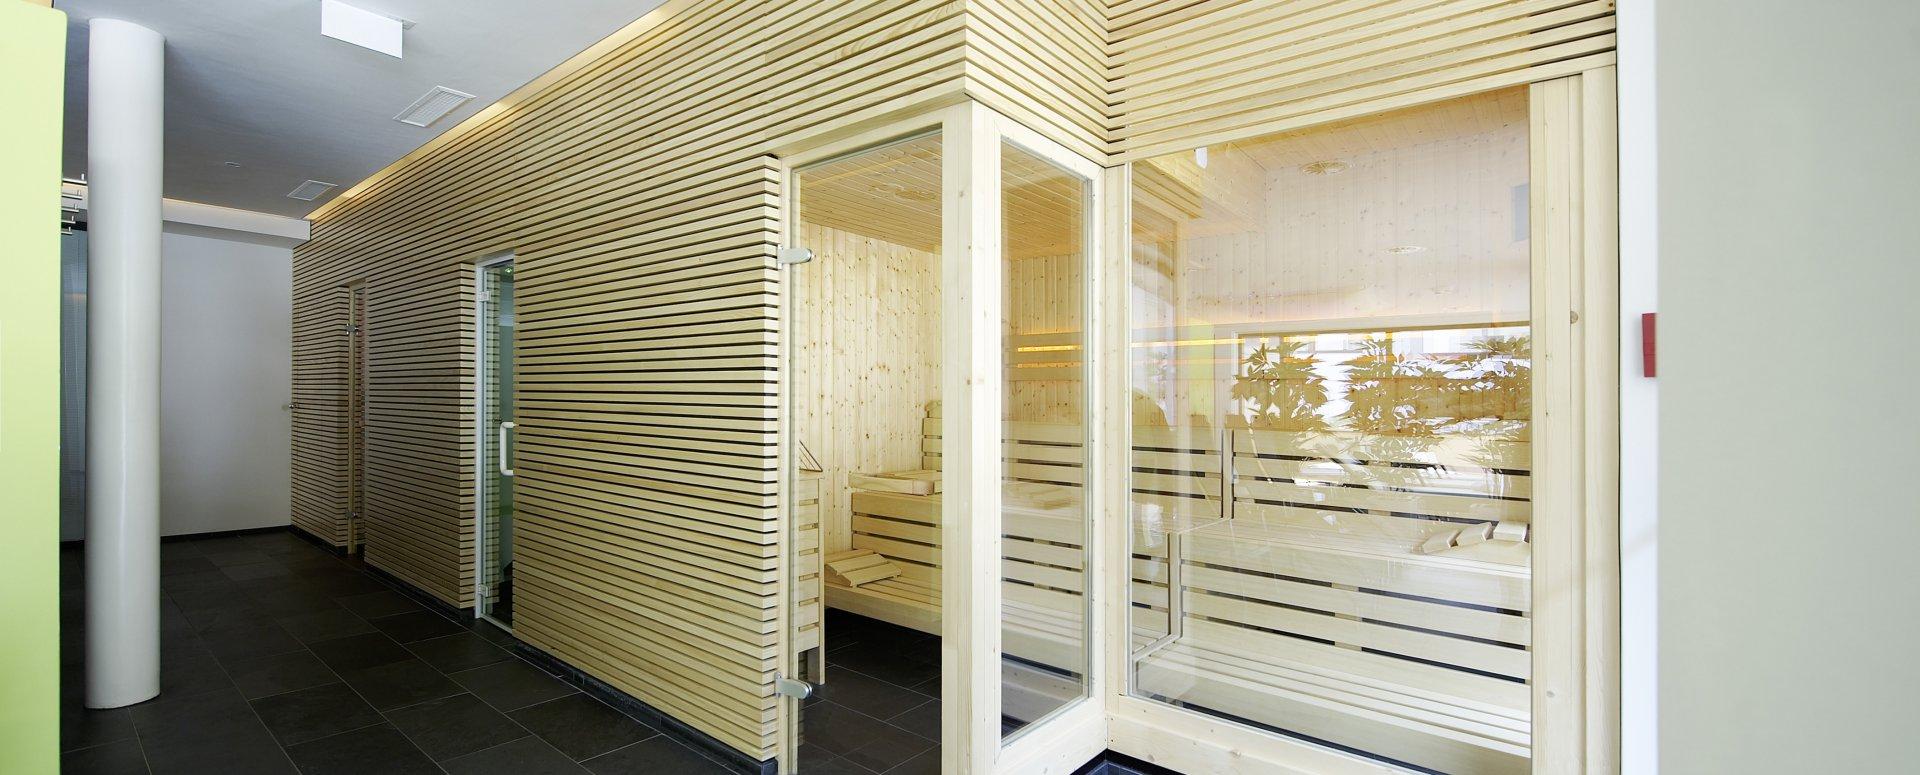 4 sterne urlaub im designhotel in brand hotel sarotla for Designhotel vorarlberg